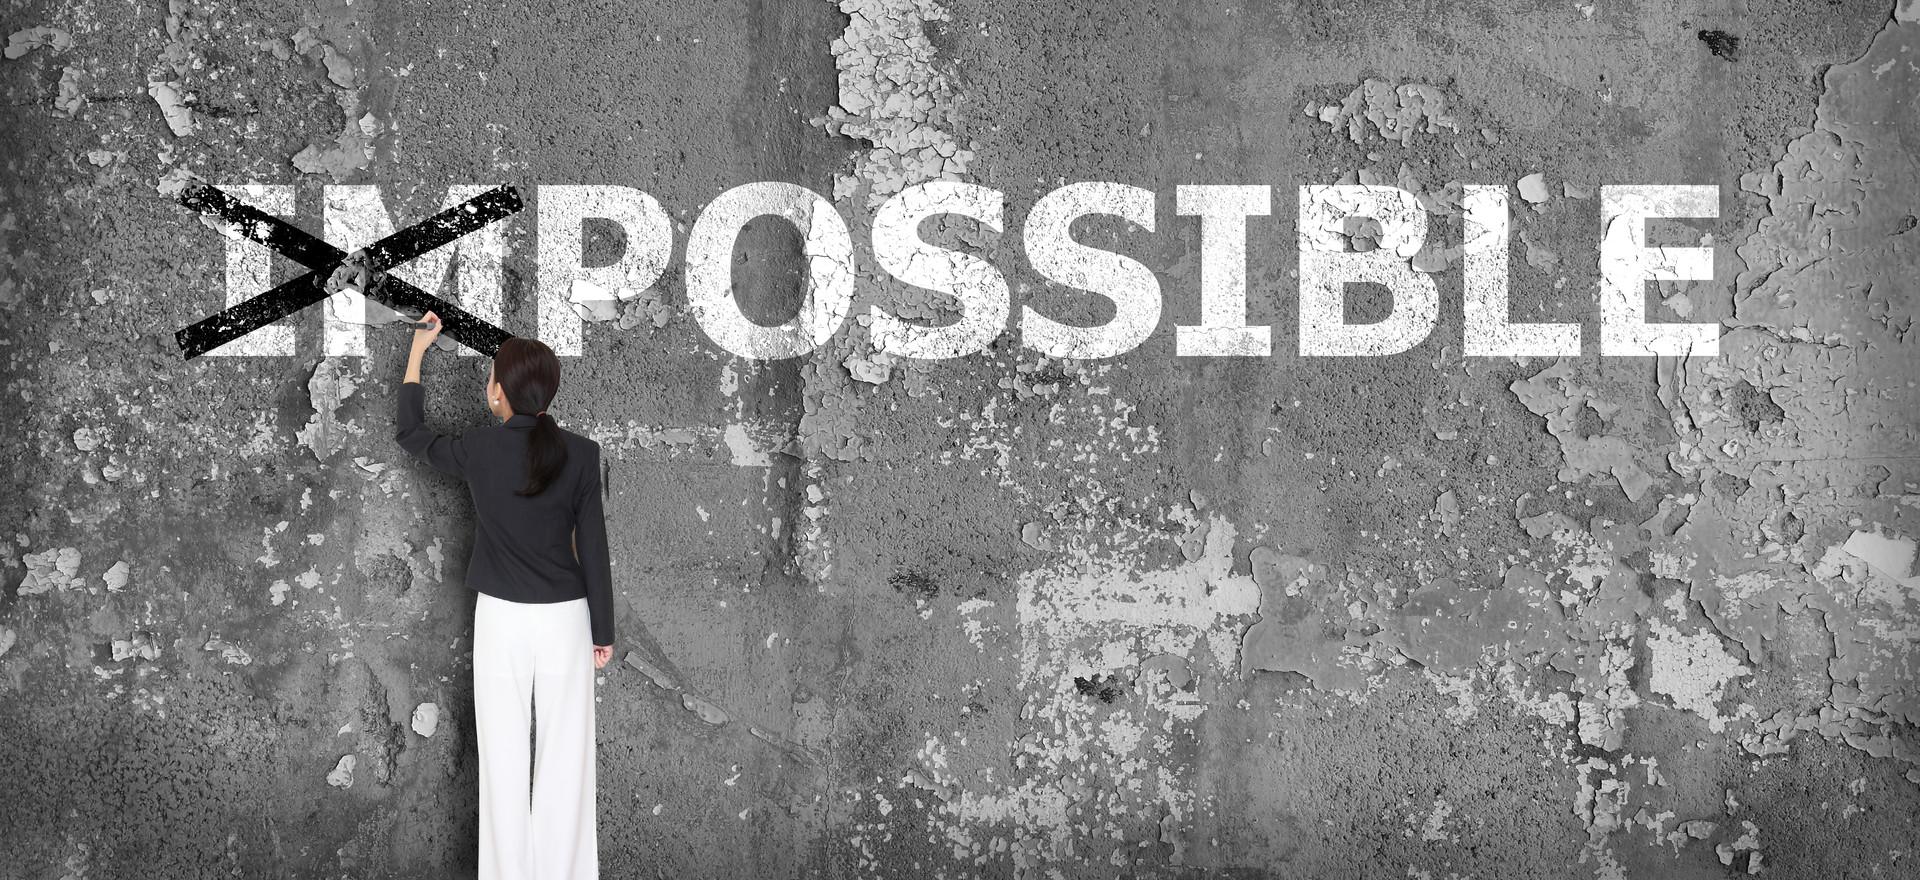 Promoting women entrepreneurs